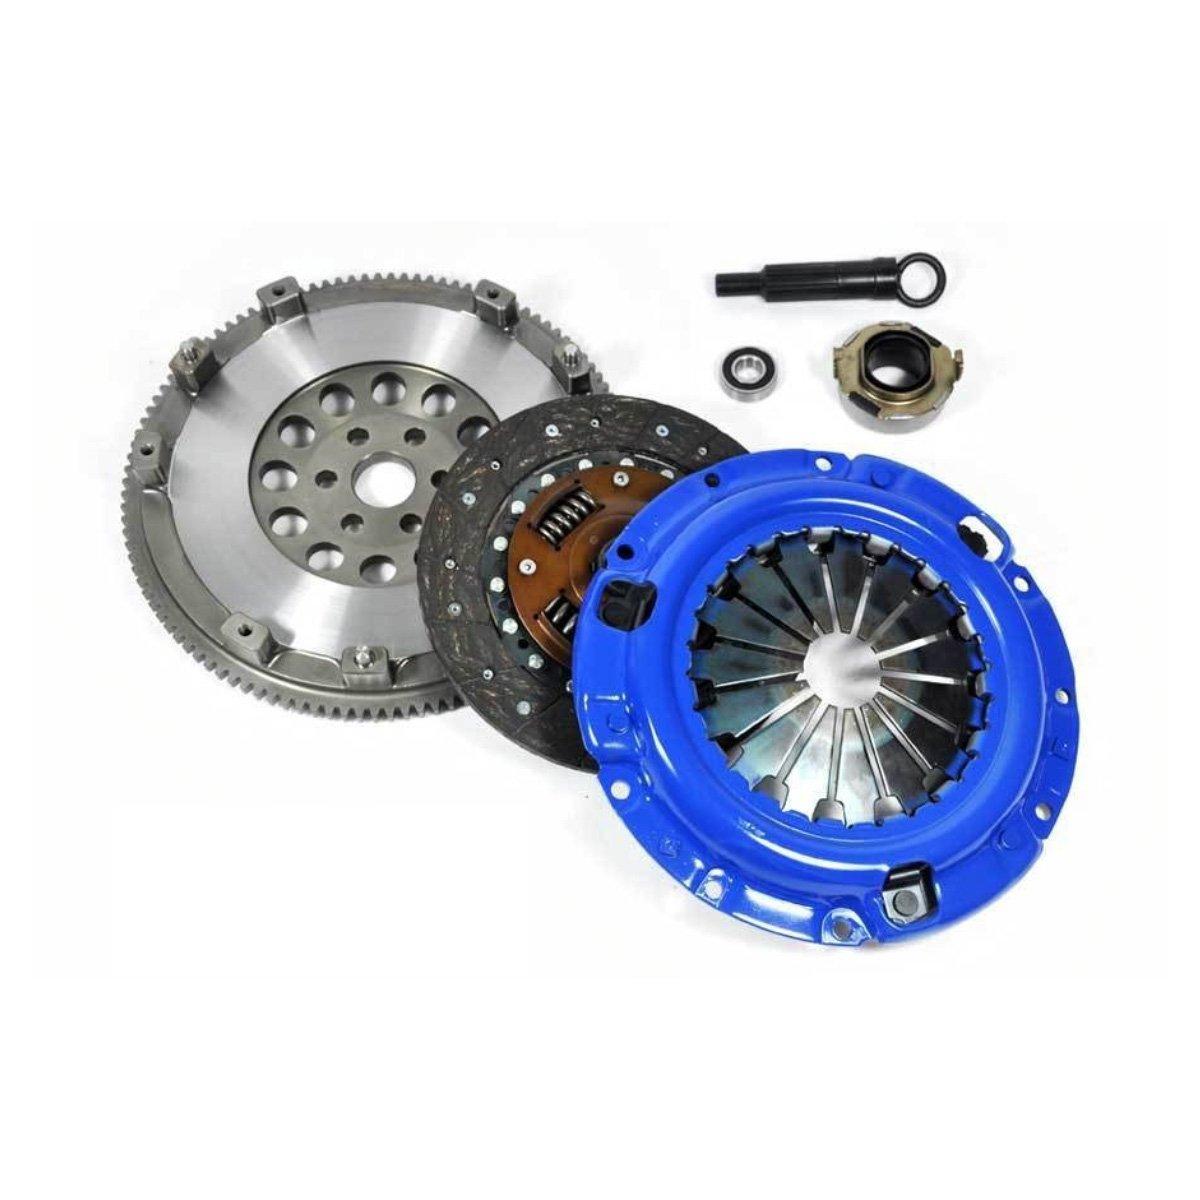 EFT etapa 1 Kit de embrague + cromo-molibdeno volante Mazda Miata 1.6L 1.8L Mazdaspeed Turbo: Amazon.es: Coche y moto